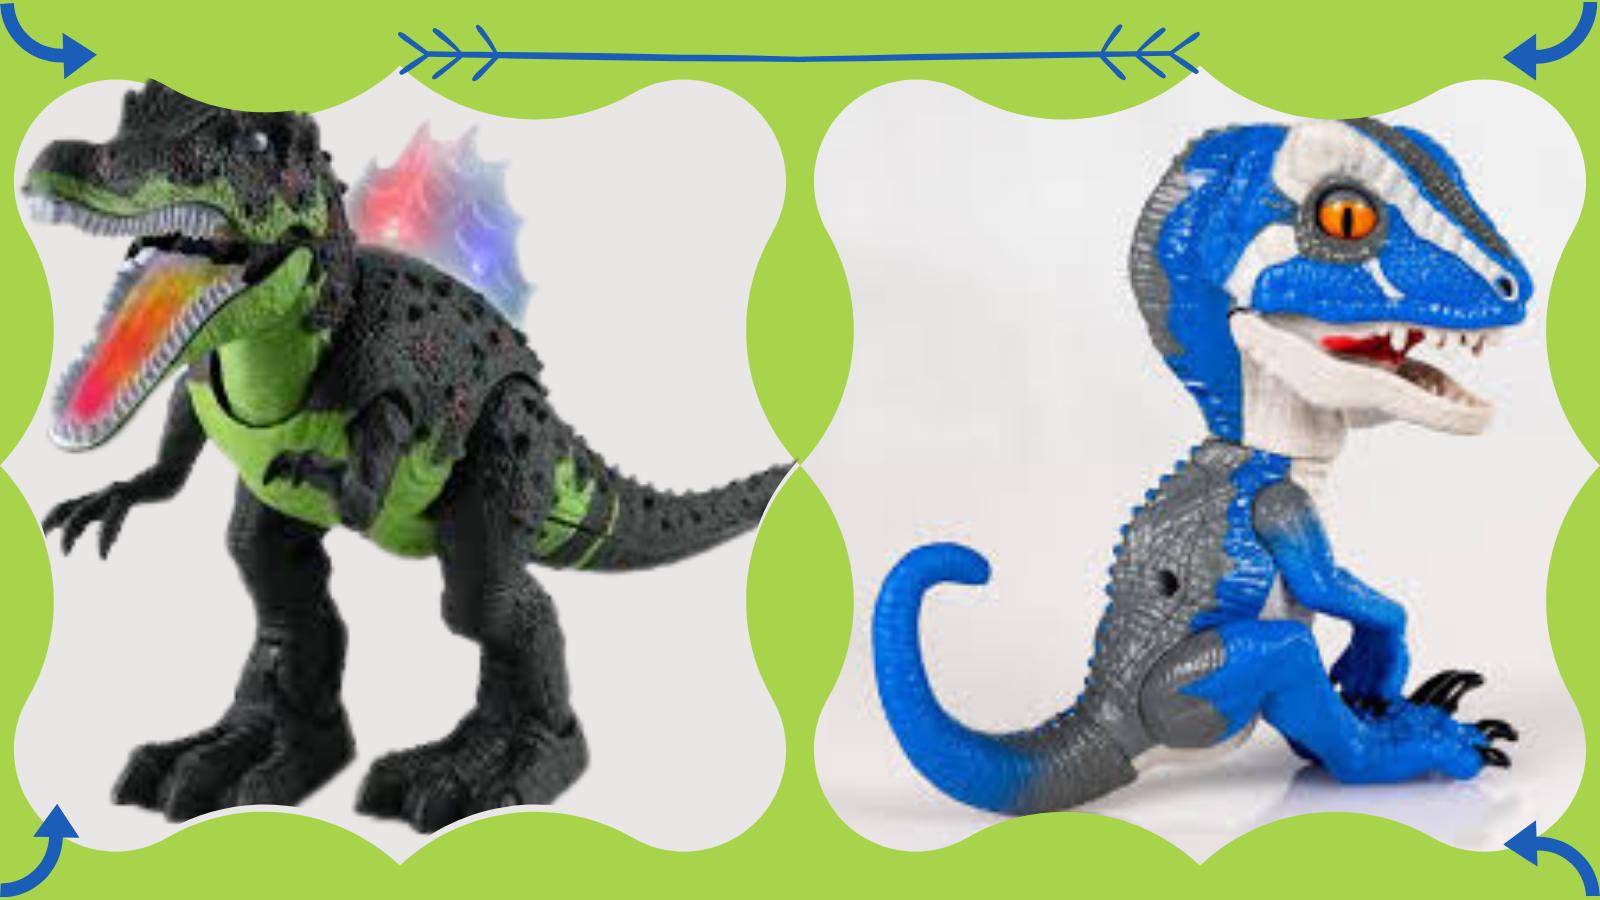 Attractive Dinosaur Toys.